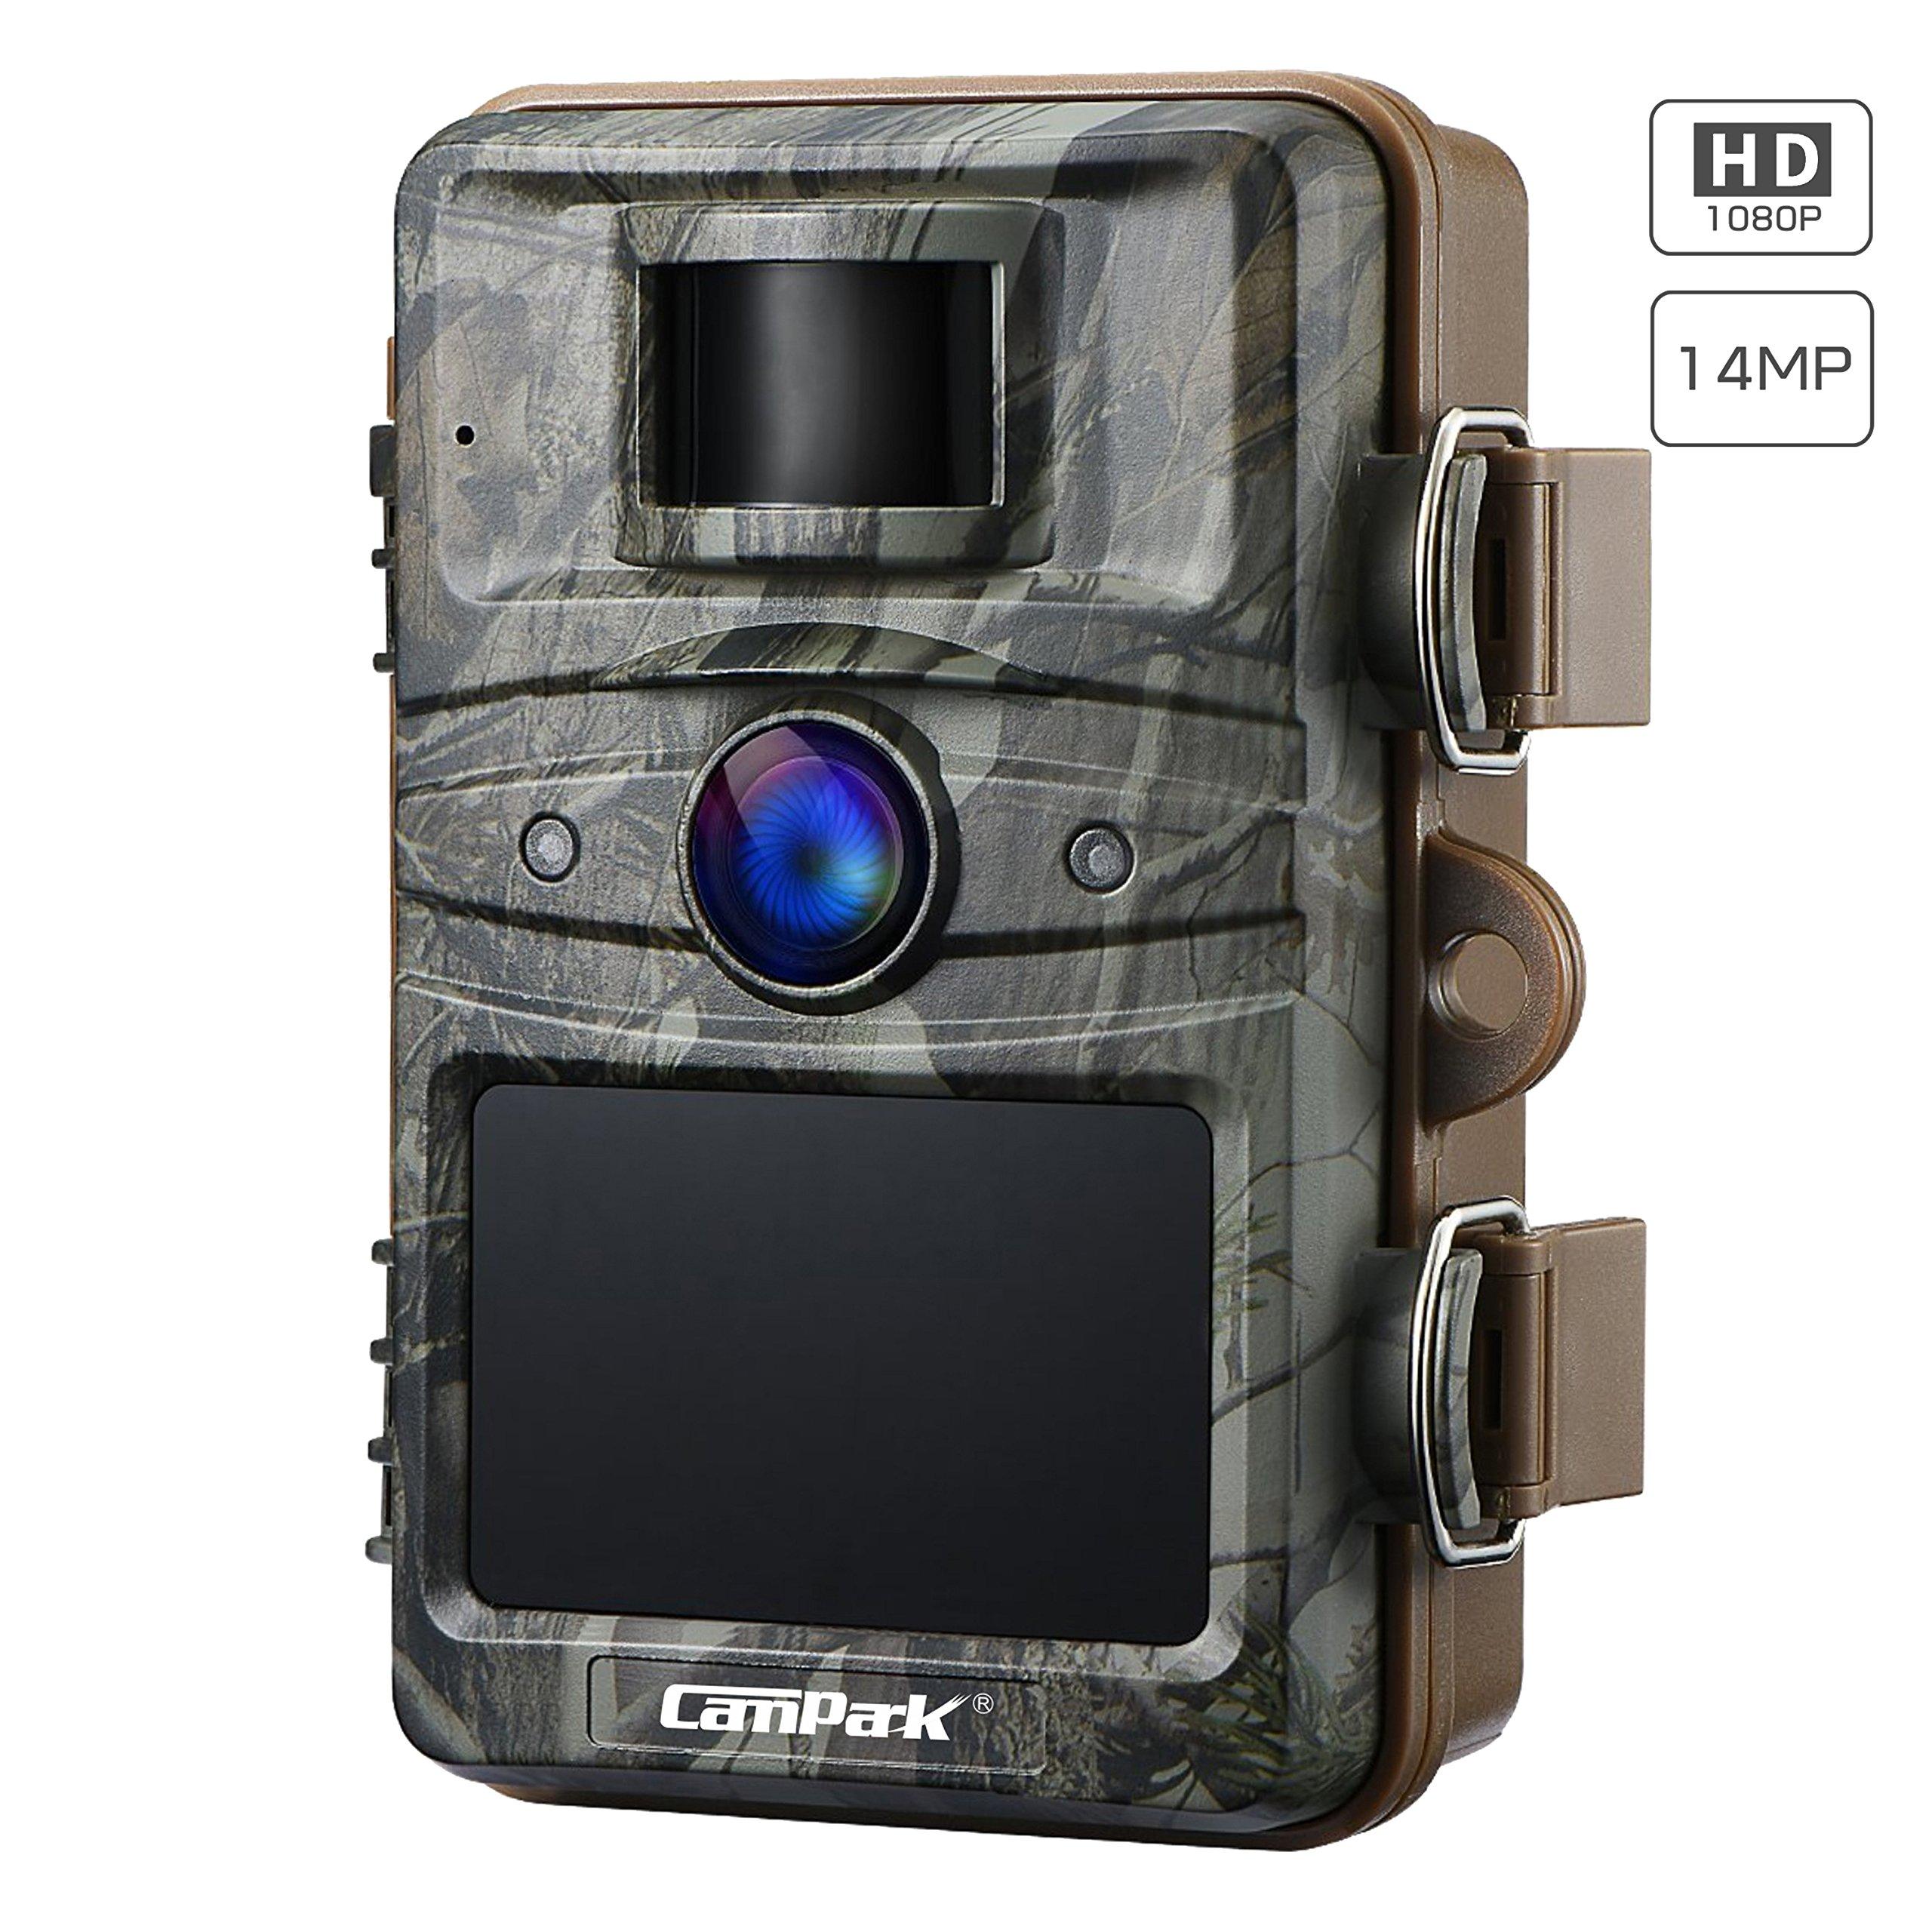 Campark 14 MP Trail Camera